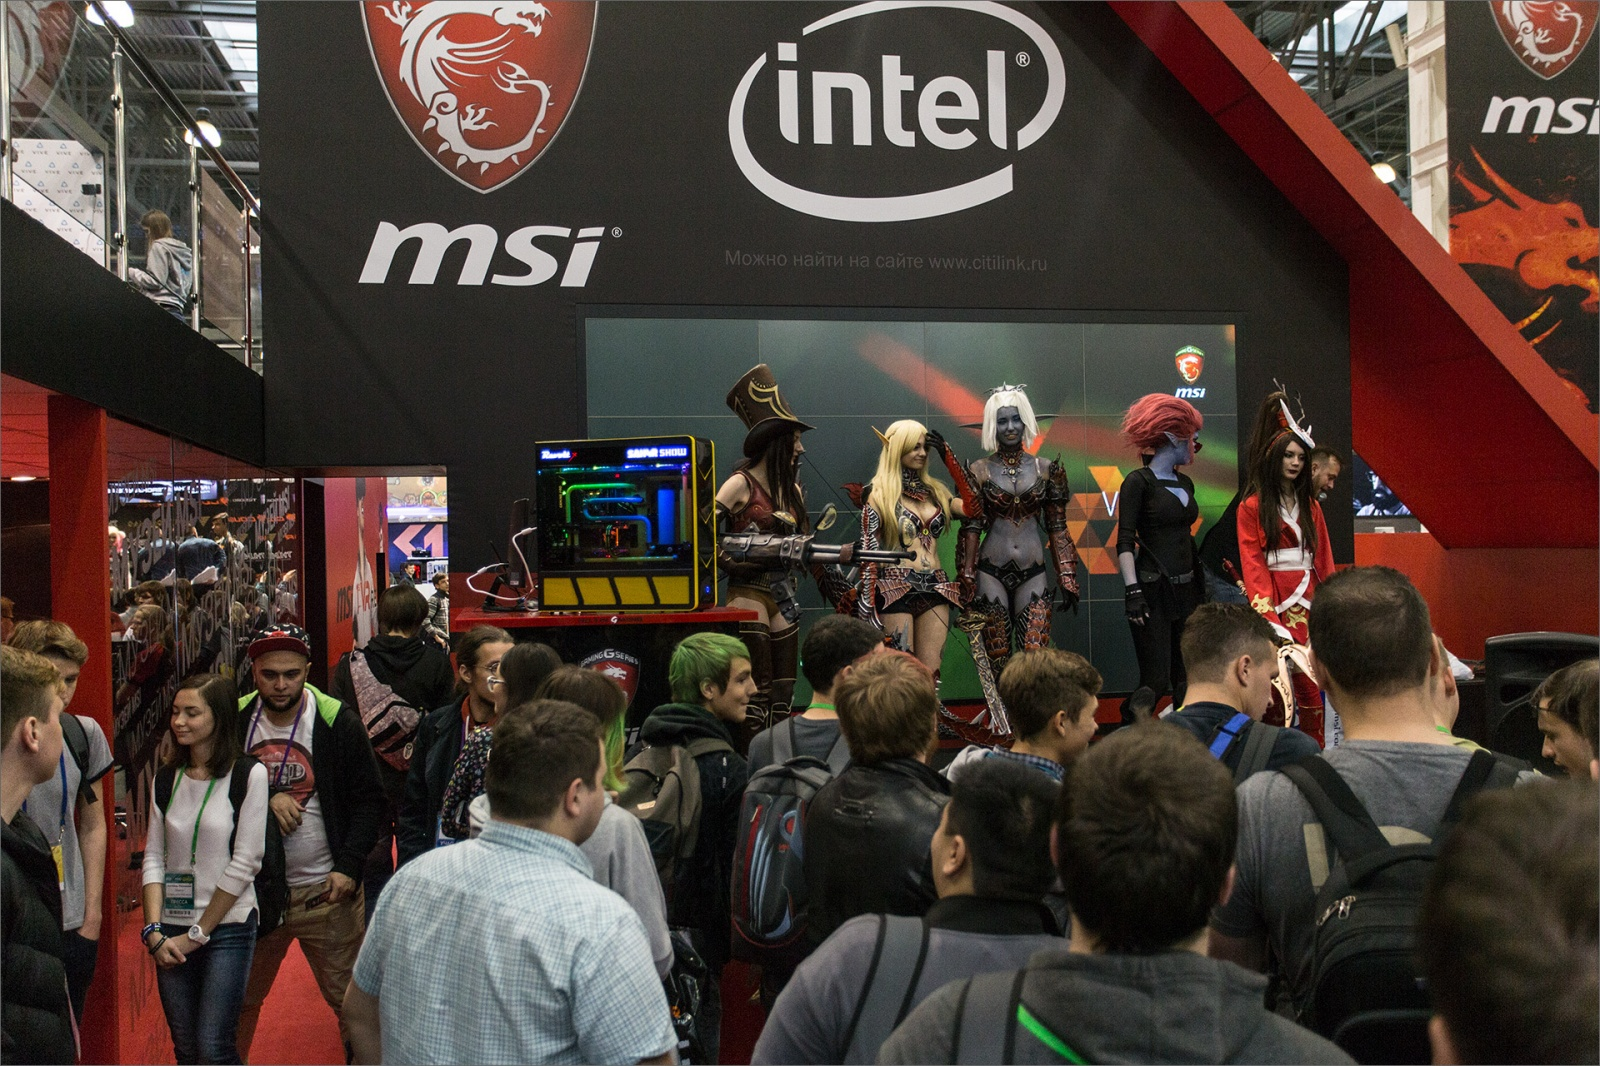 Intel значит побеждать: захват игромира прошёл успешно - 10